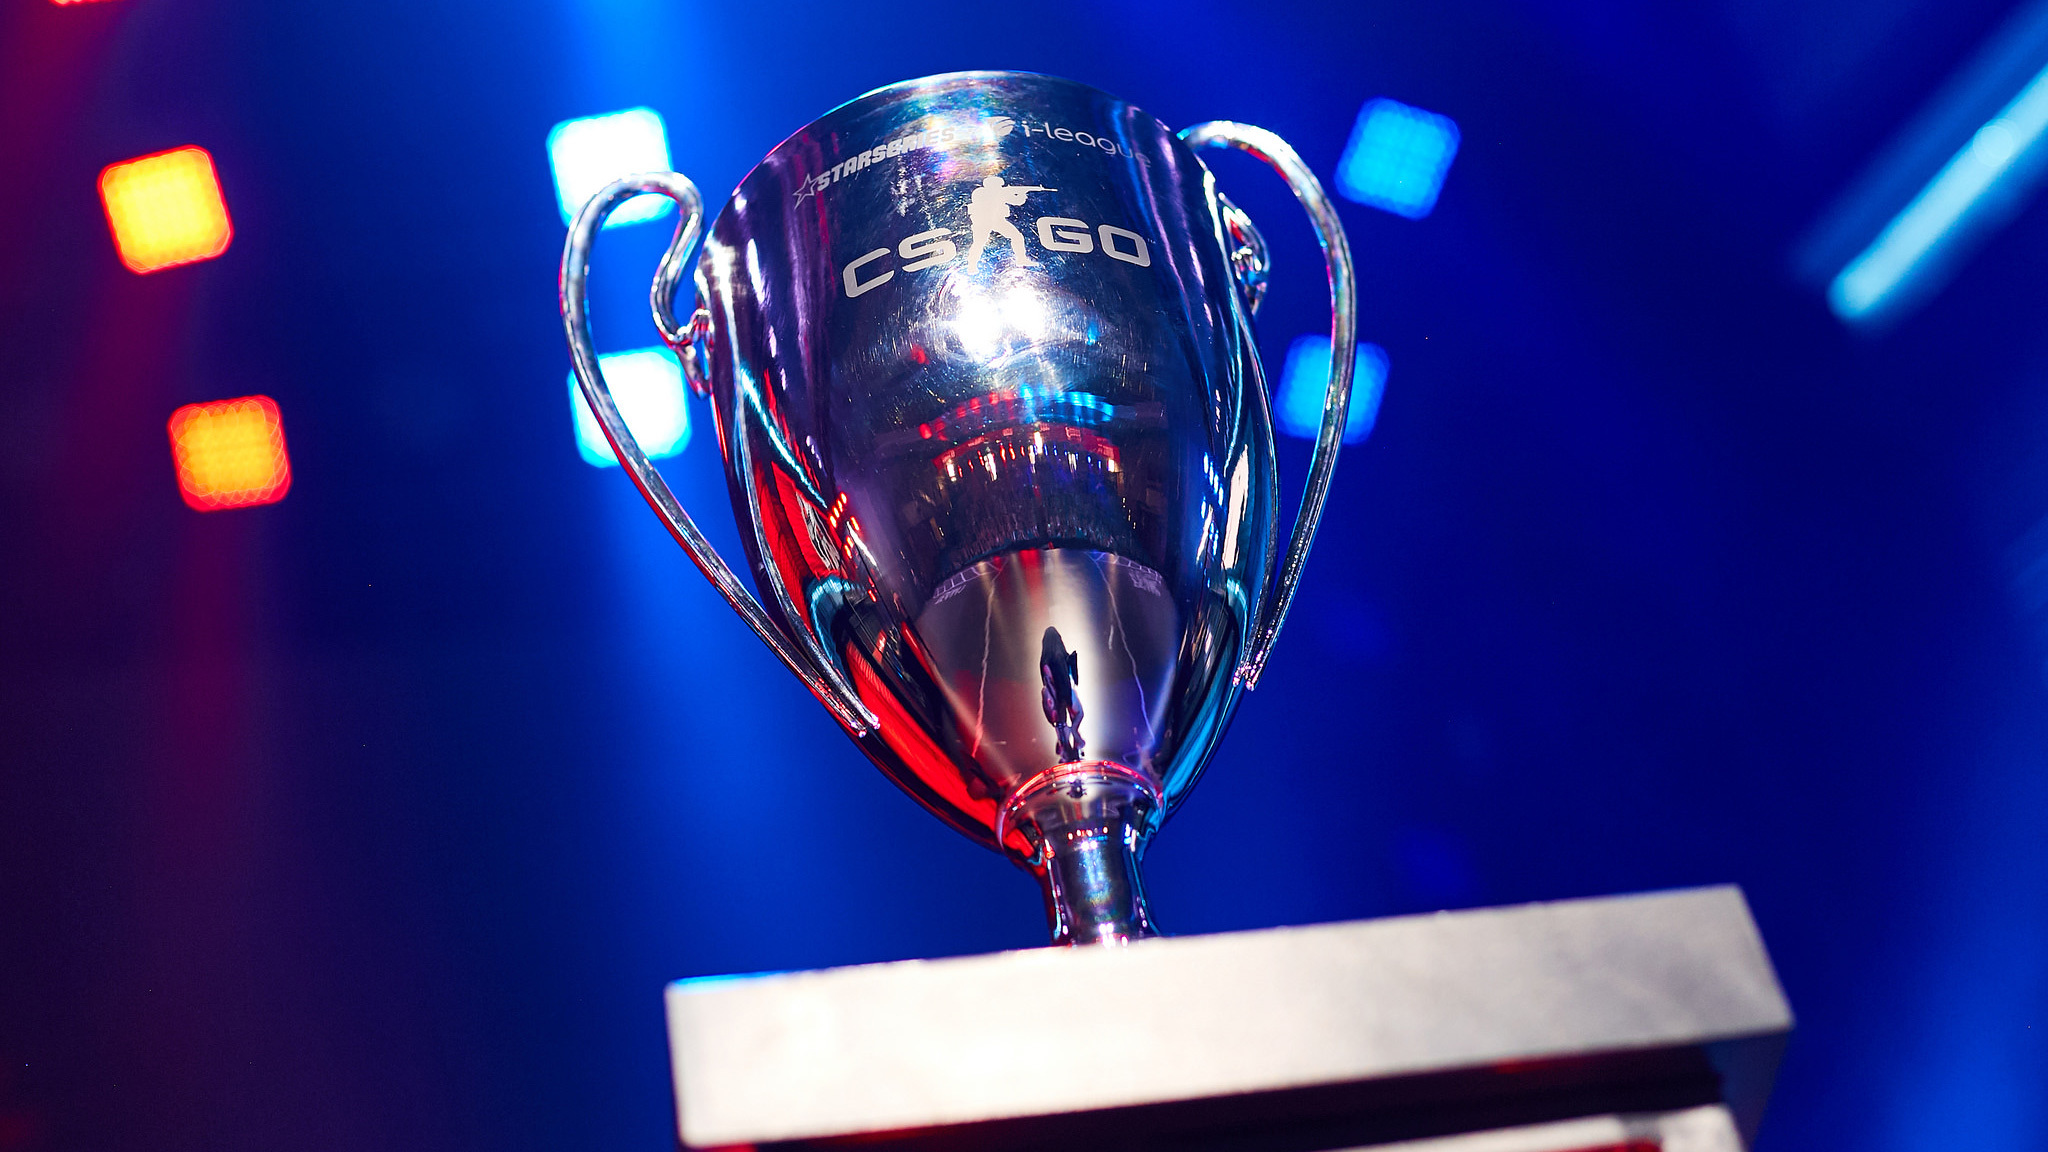 StarSeries i-League CS:GO Season 7: Viewer's guide